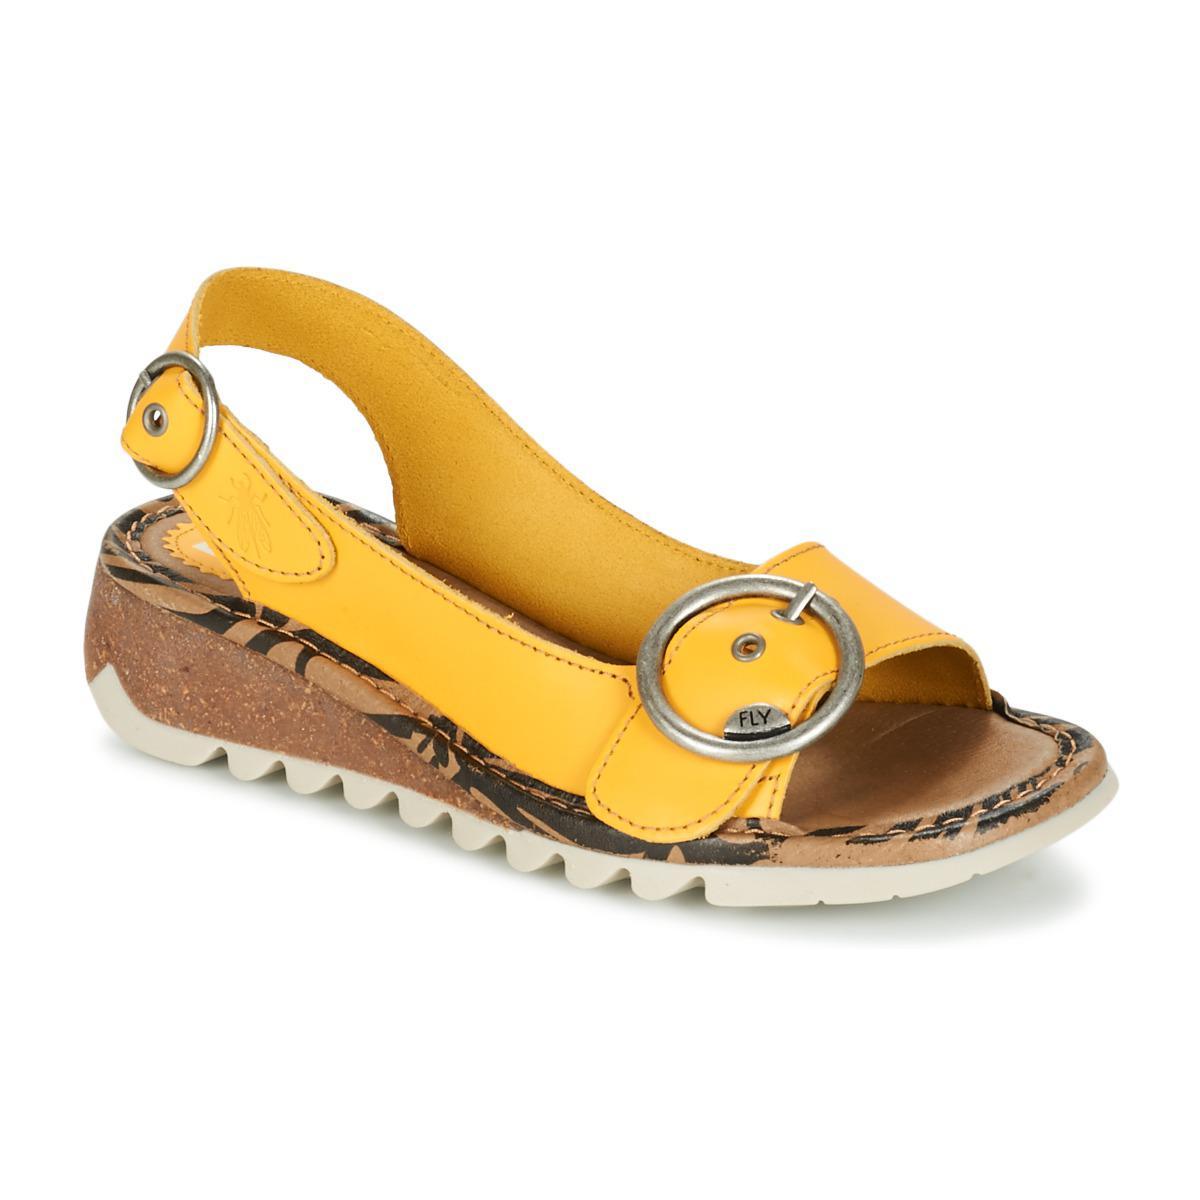 0bee5ff5d3c4c Fly London Tram Women's Sandals In Yellow in Yellow - Lyst